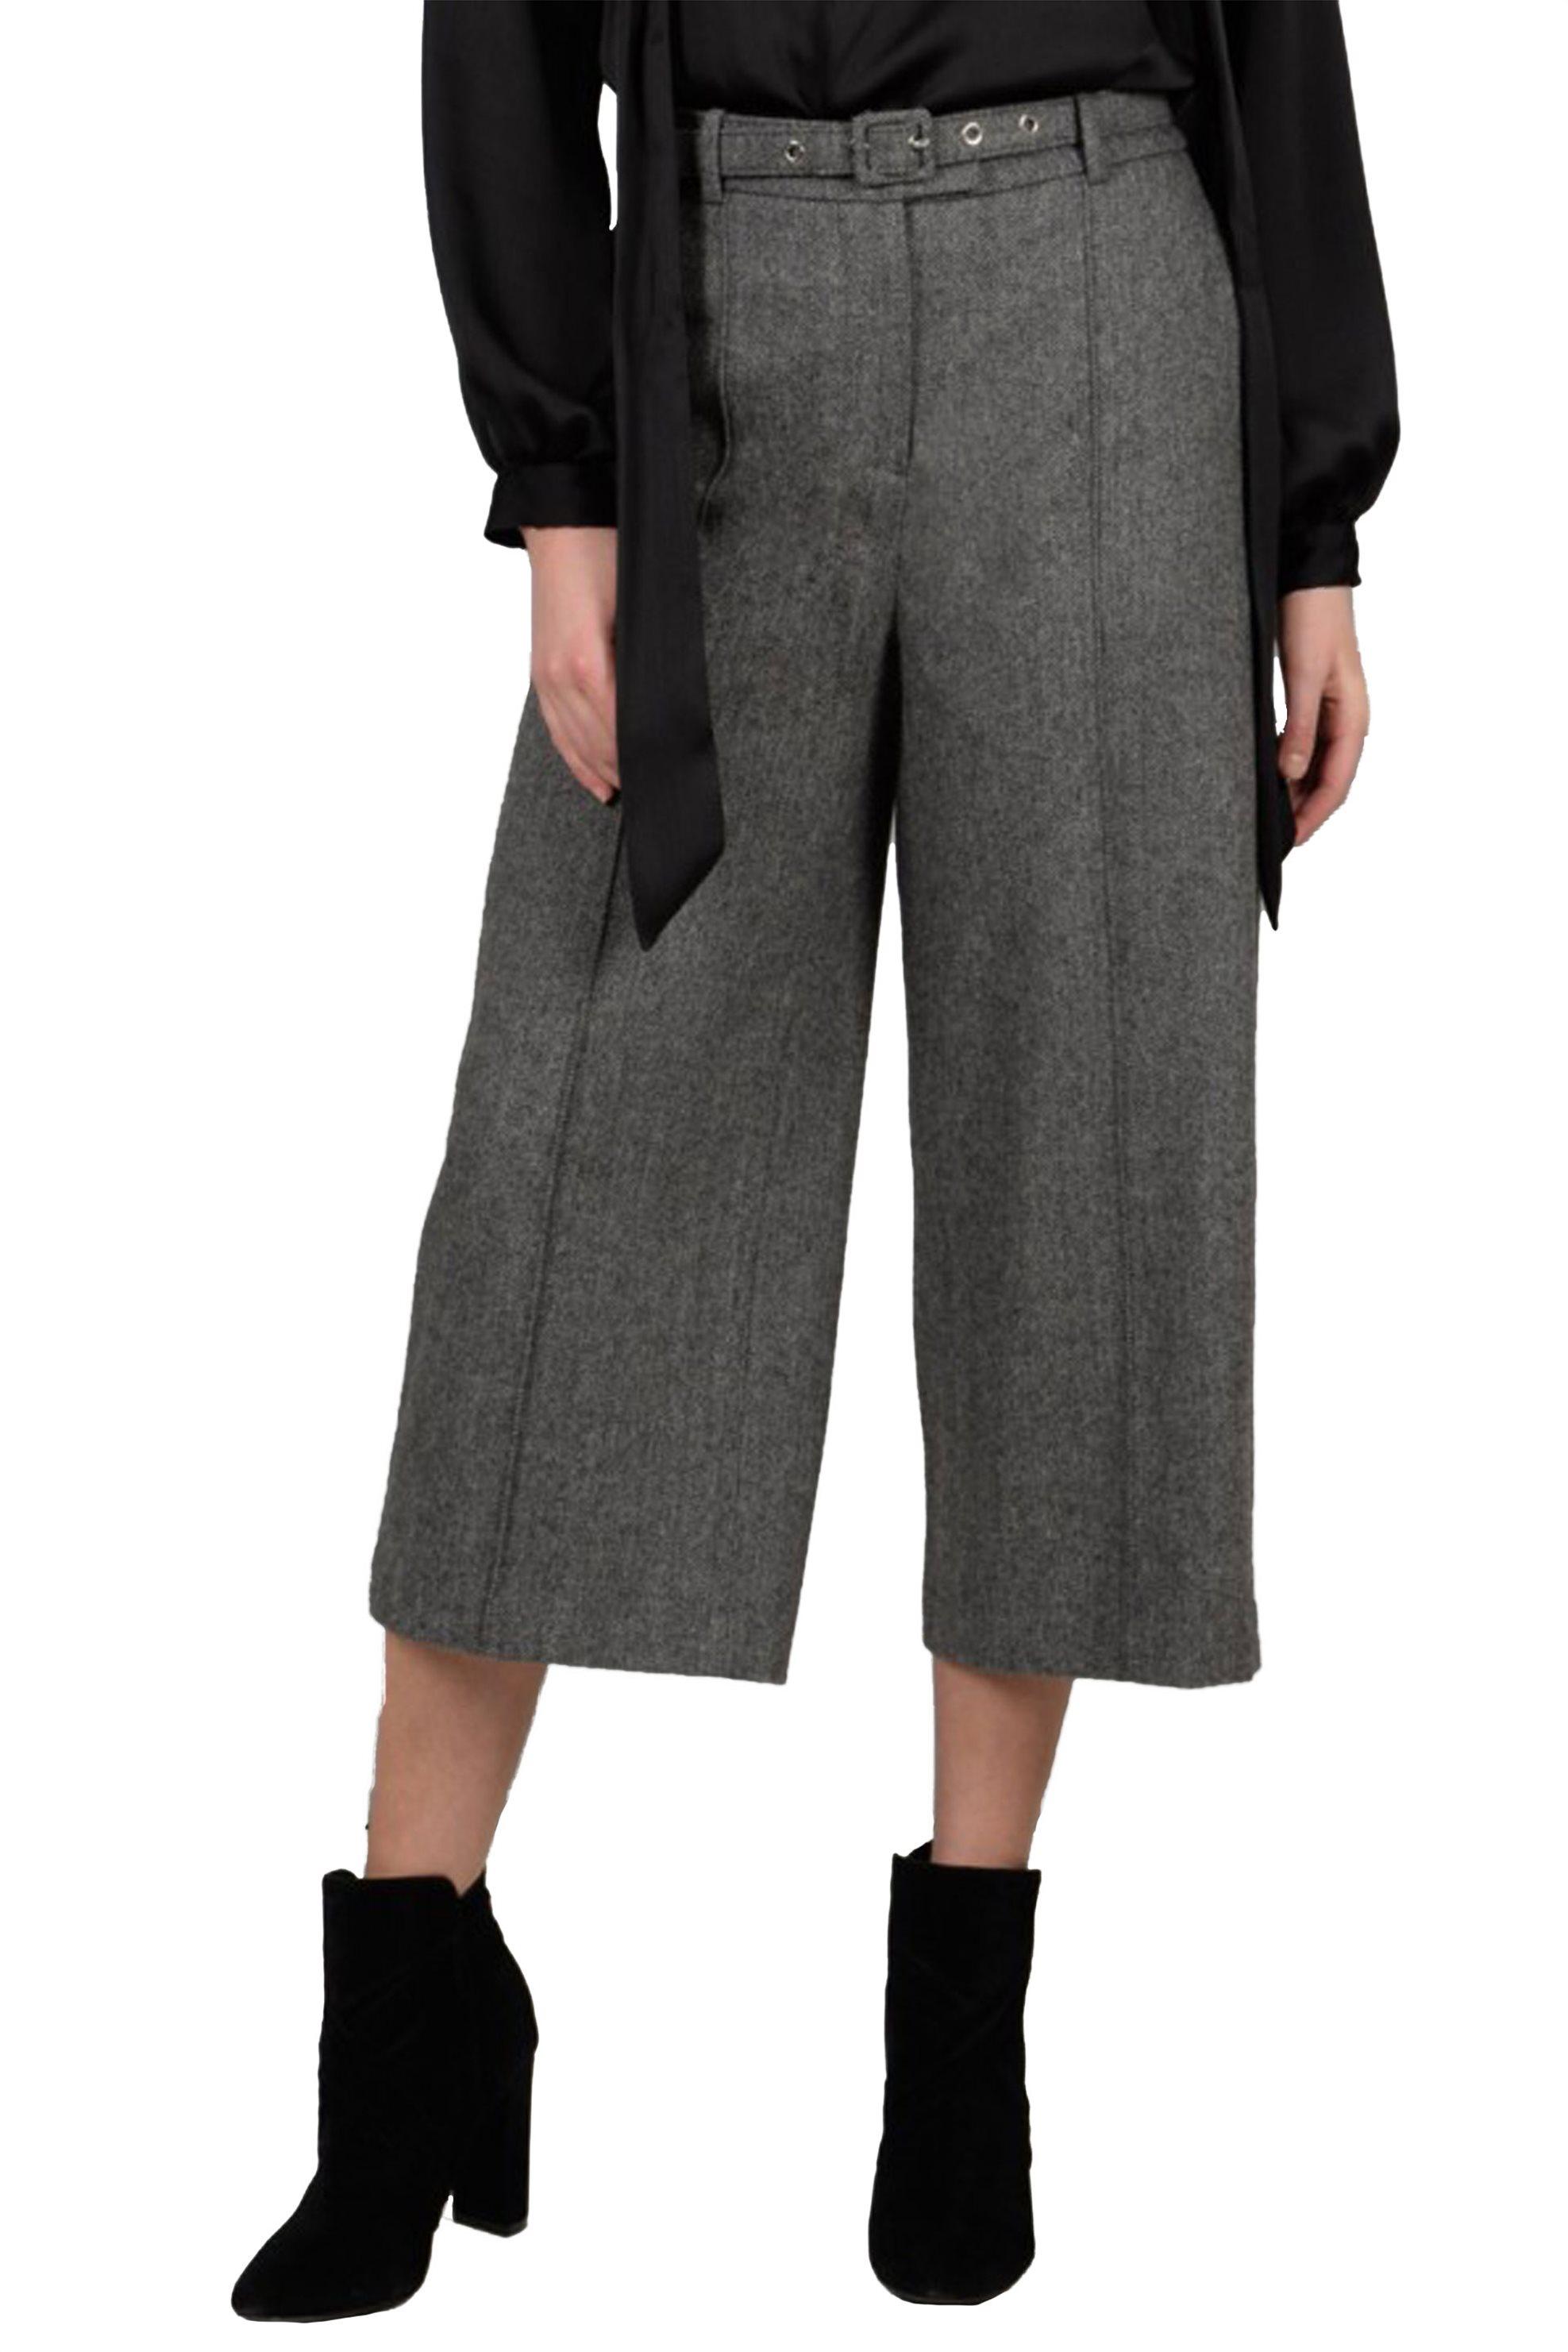 Notos Molly Bracken γυναικείο παντελόνι capri σε φαρδιά γραμμή με ζώνη -  W18MB-T671 - Γκρι 9bdd3424f09